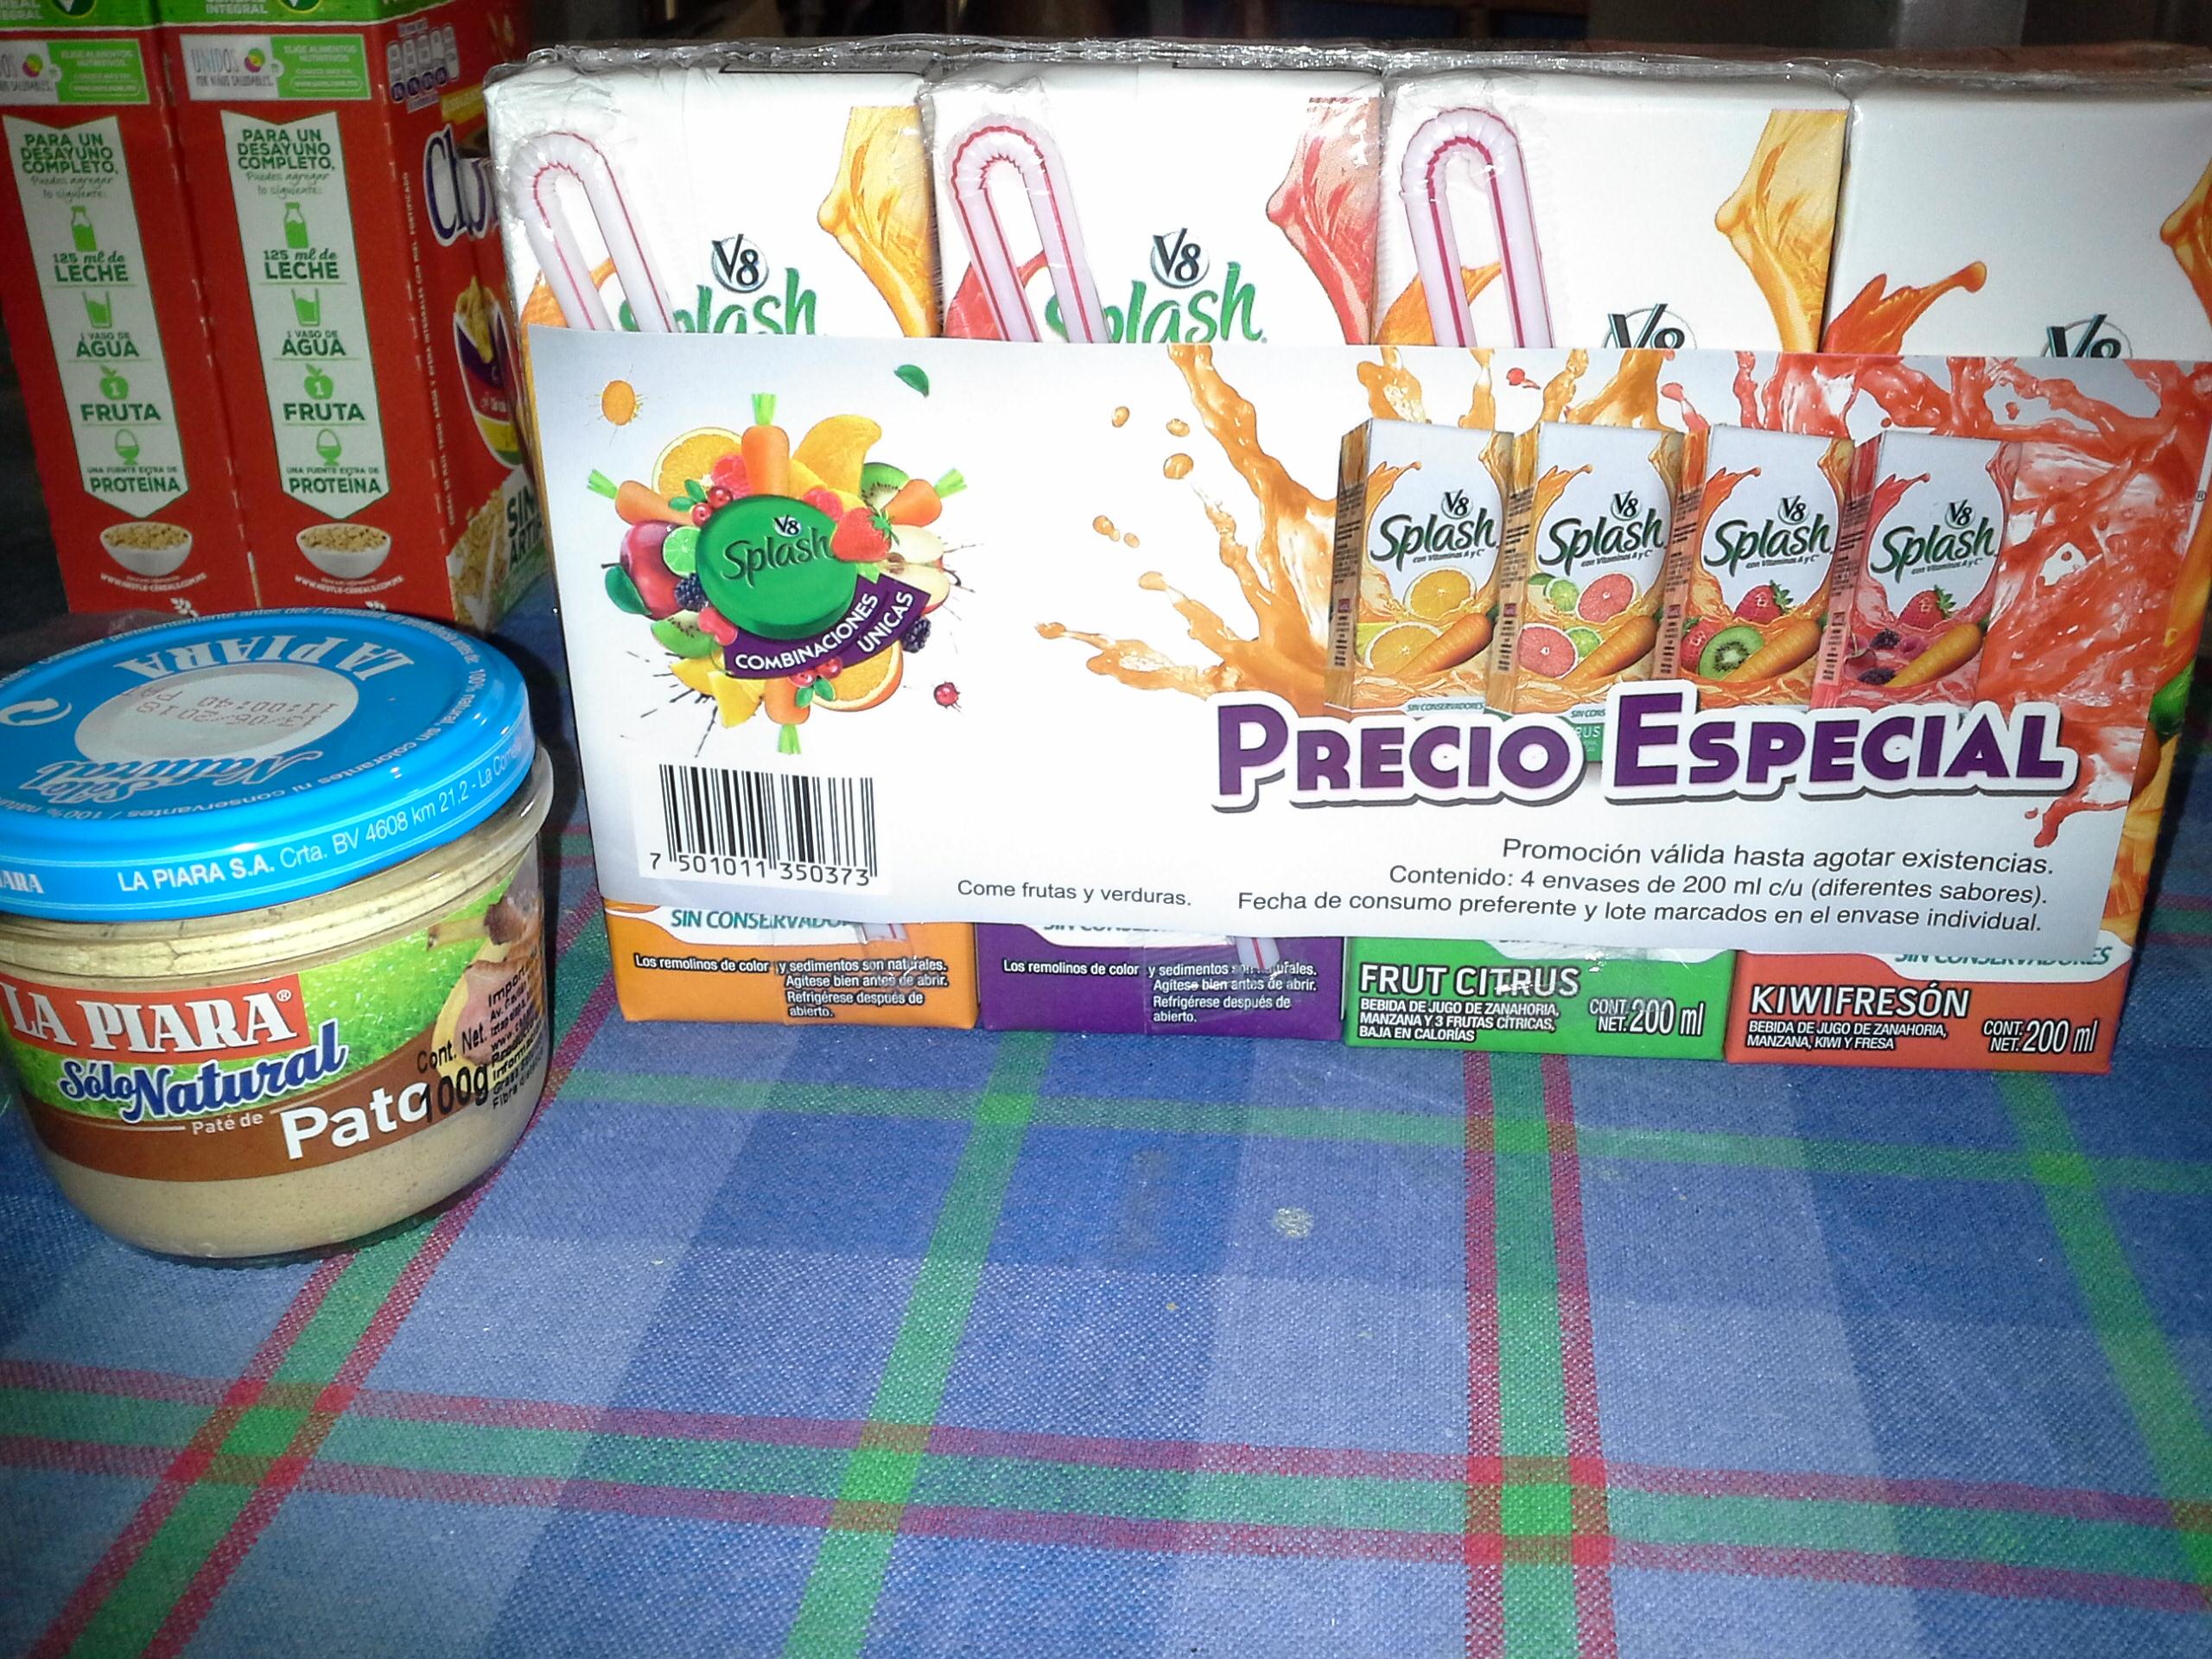 Walmart Torres Lindavista: Pate de pato a $16.03